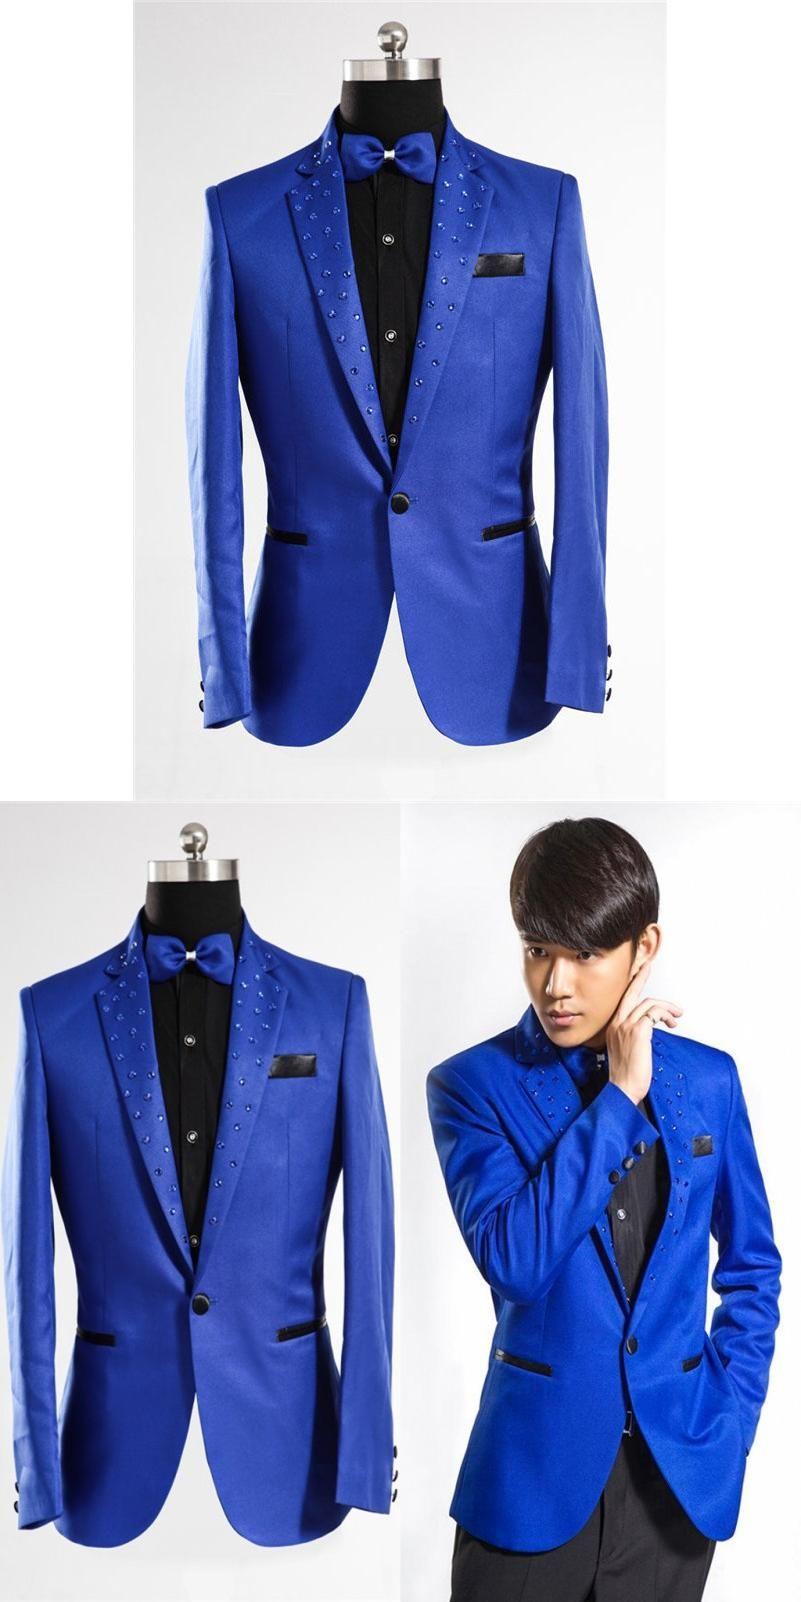 Royal Blue Tuxedo Men fashion 2017 Brand-Clothing Suit Jacket Men Stage  Blazer Costumes Men Suit Jacket Royal Blue Blazer Men b7739ccf4f67